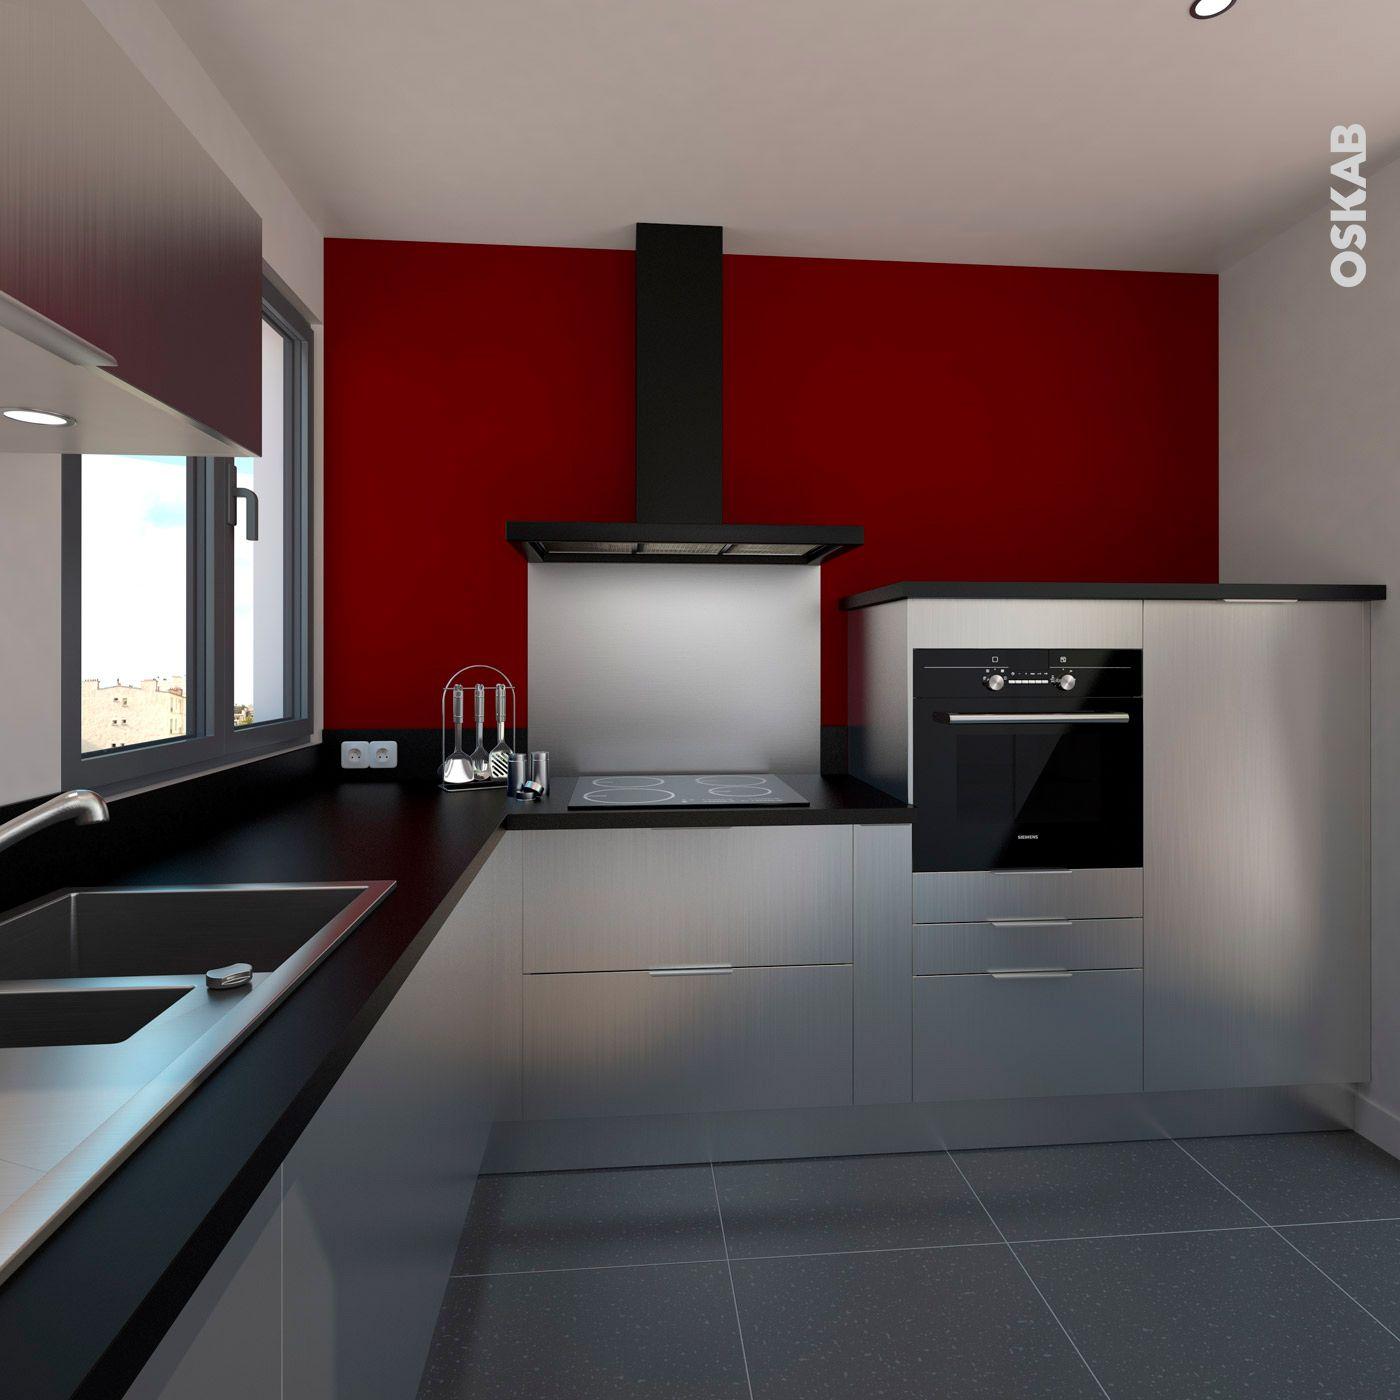 Cuisine style industriel petite cuisine d cor inox effet - Cuisine plan de travail inox ...